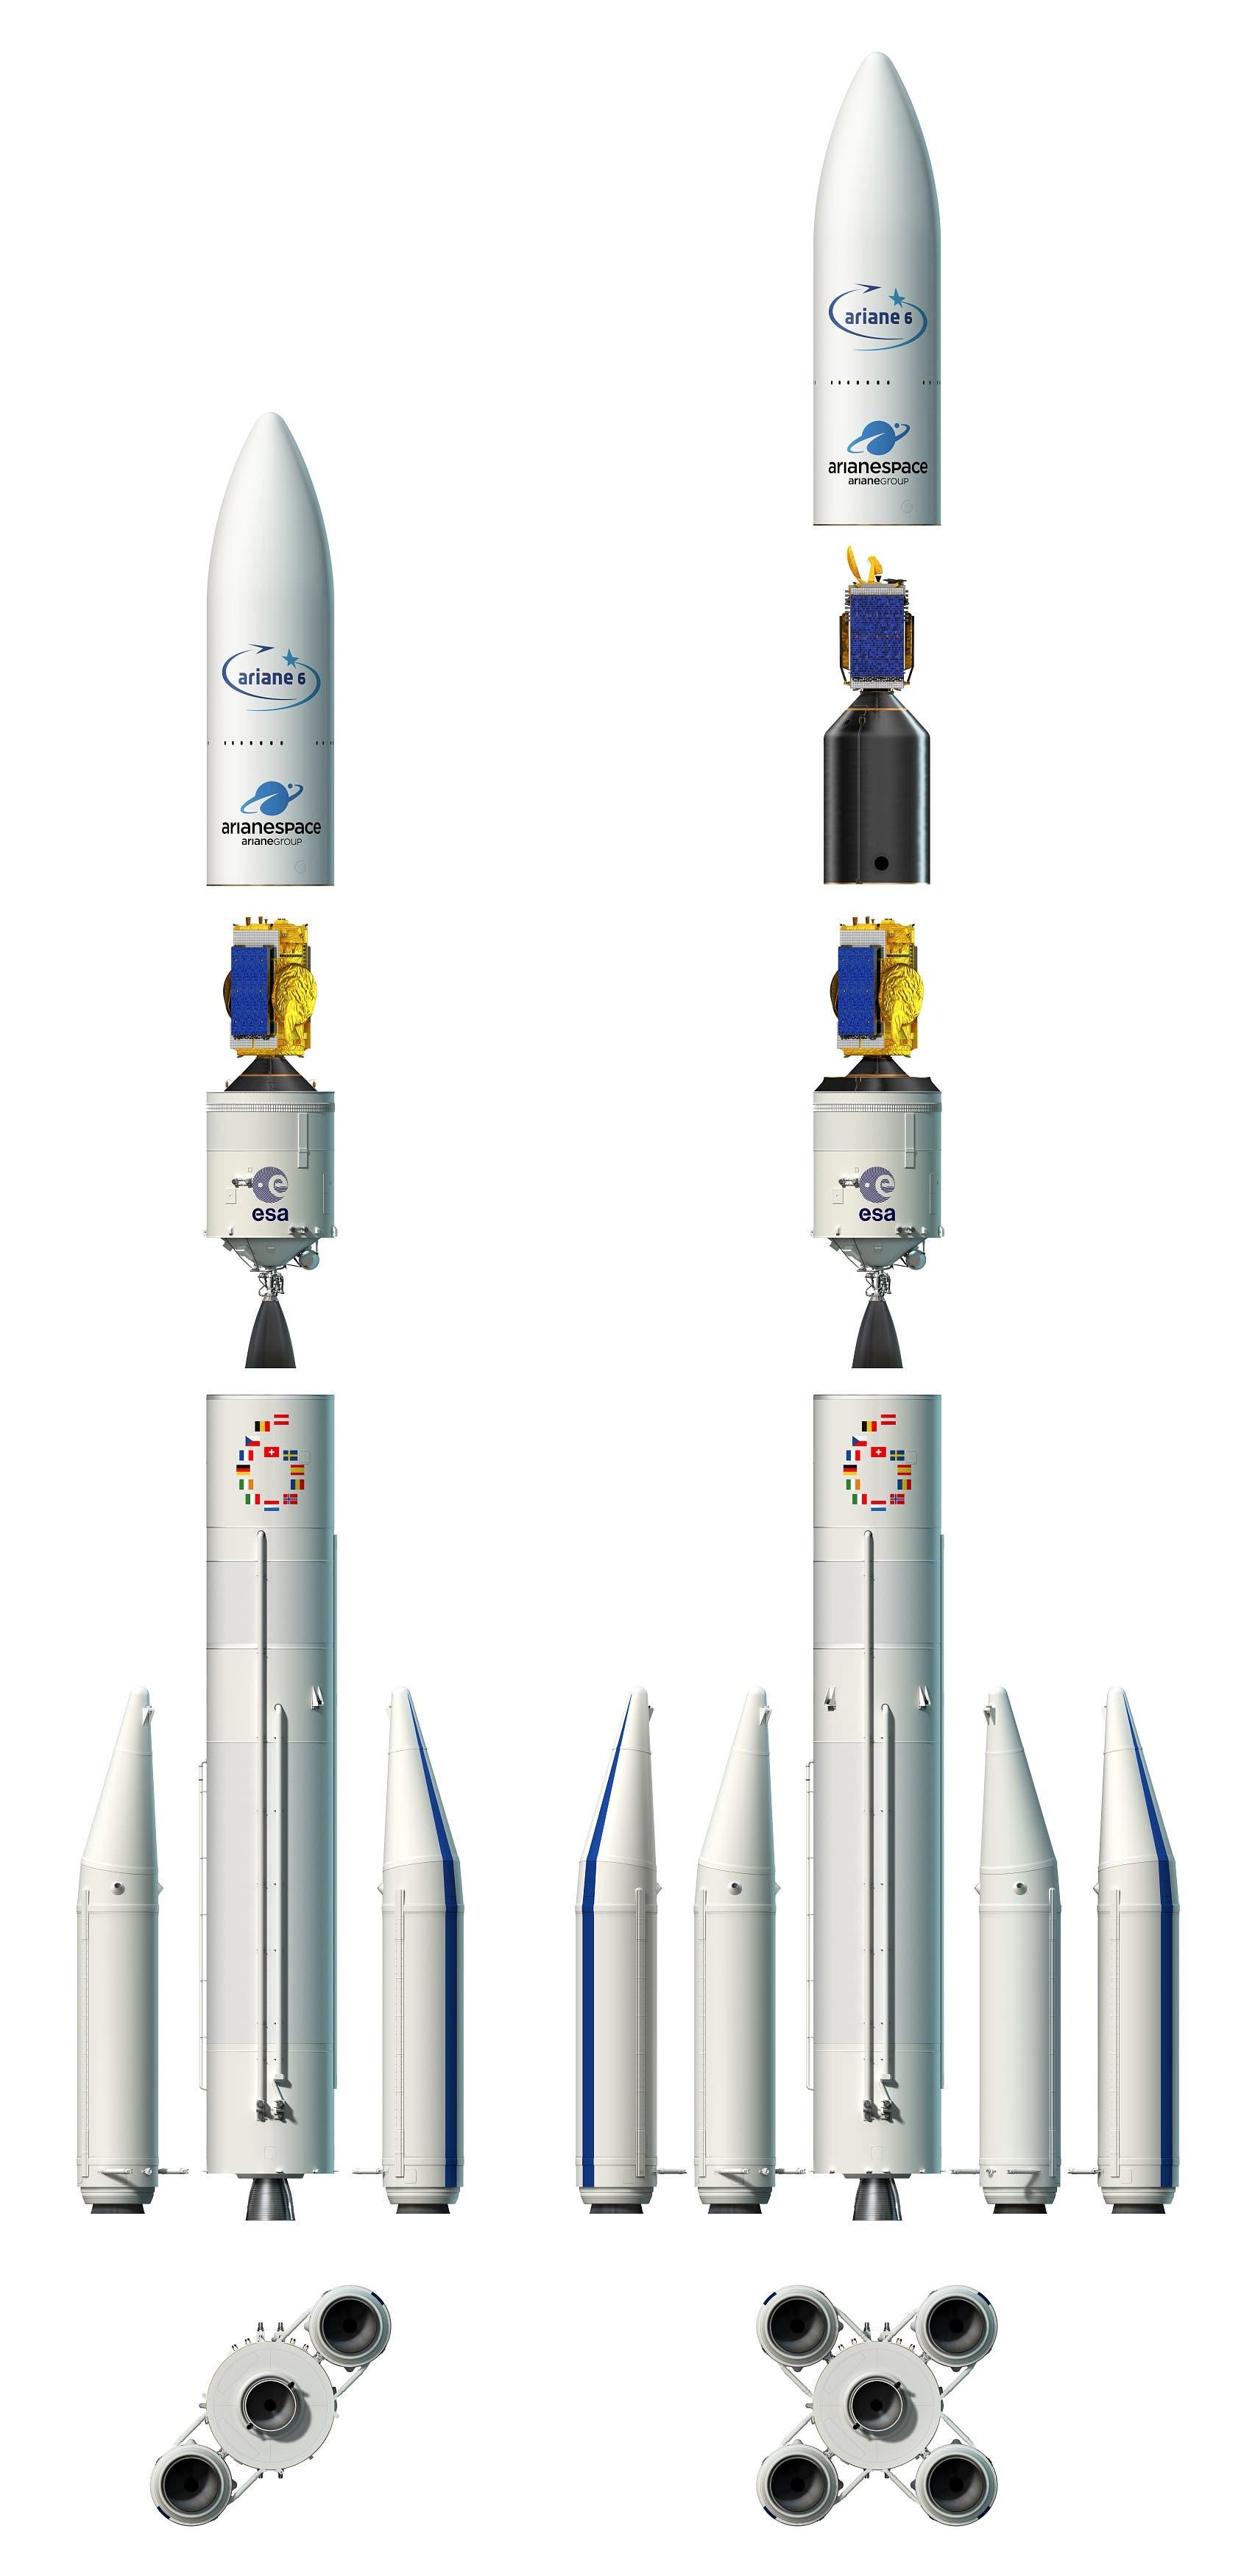 Aufbau der Ariane 6